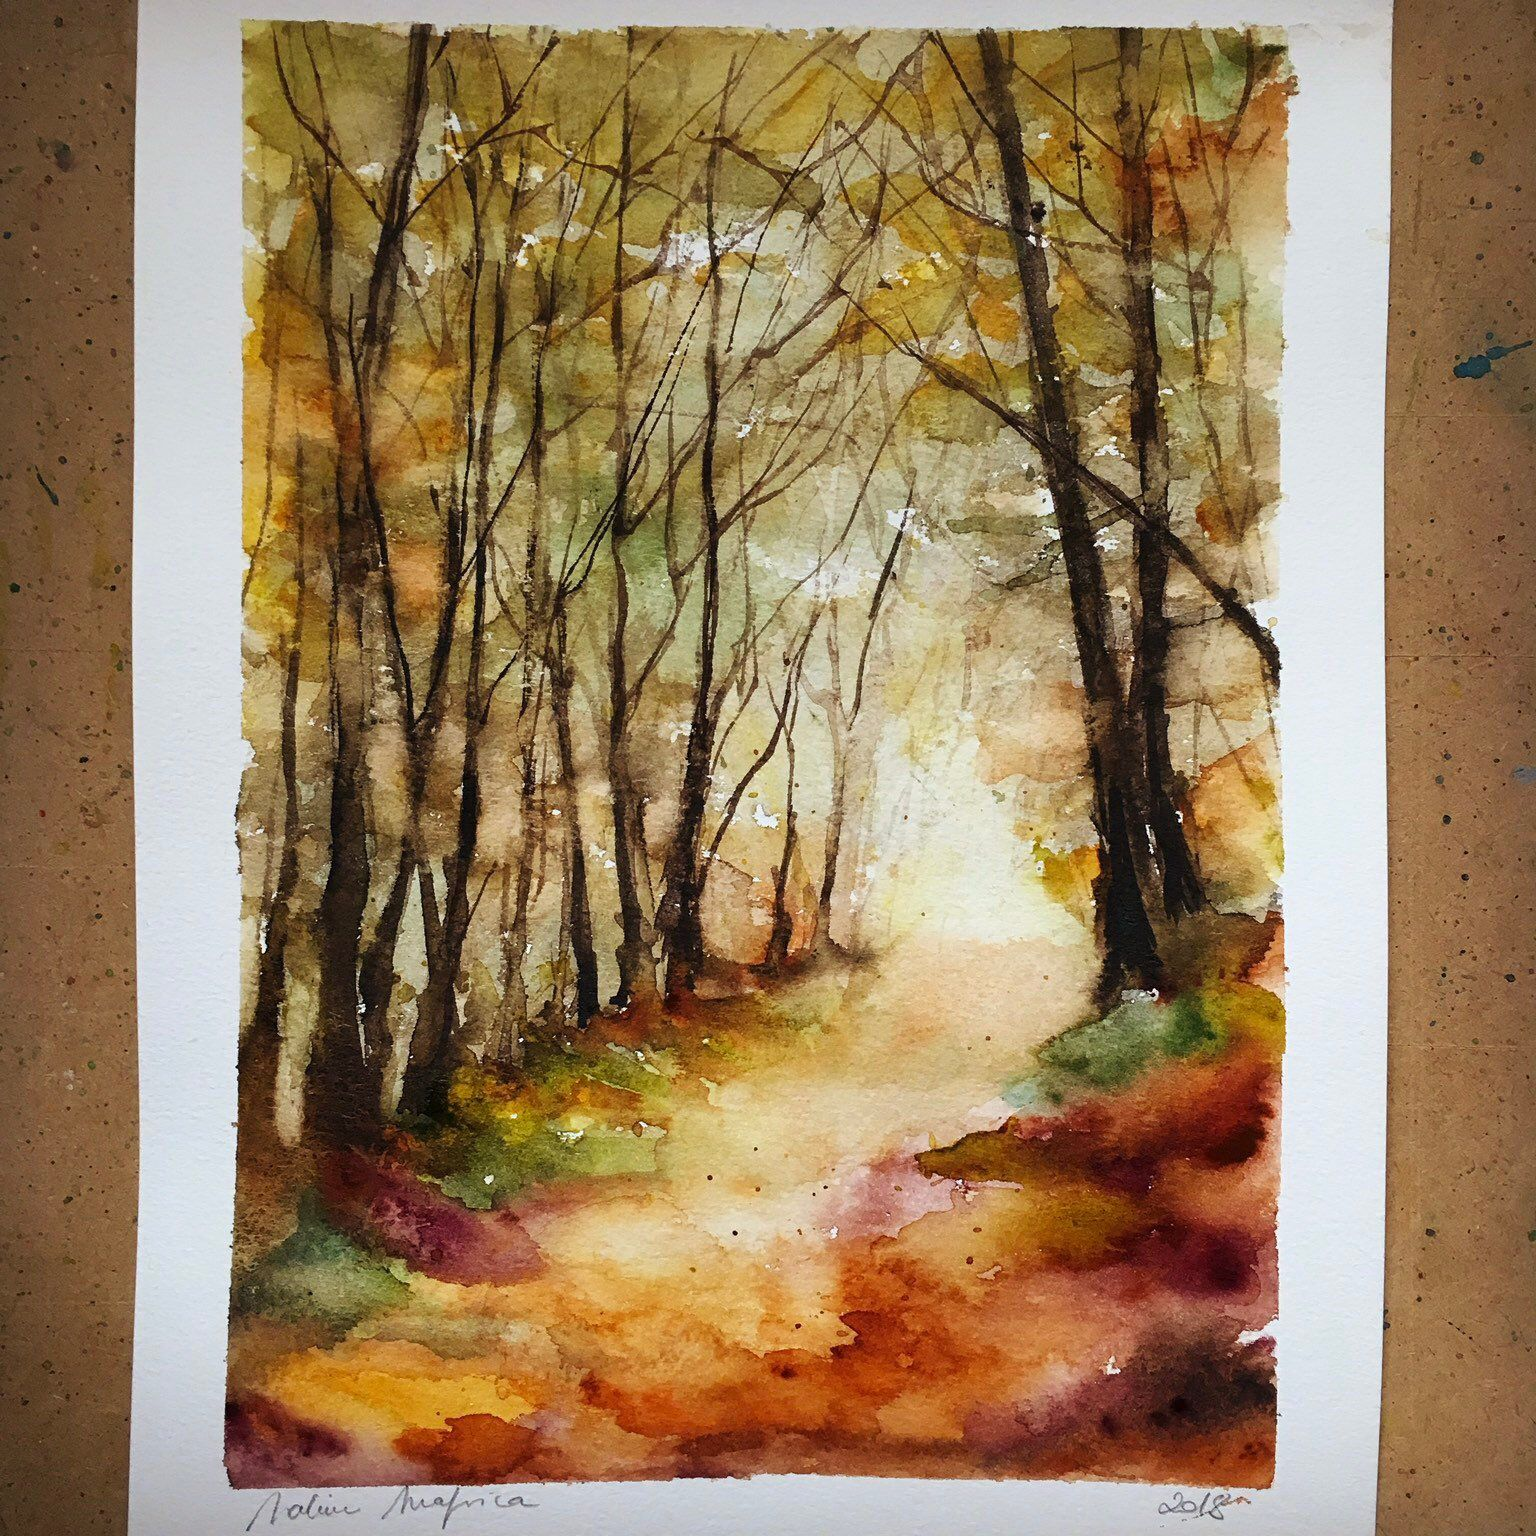 Aquarelle Peinture Originale Foret En Automne Woodland Fall